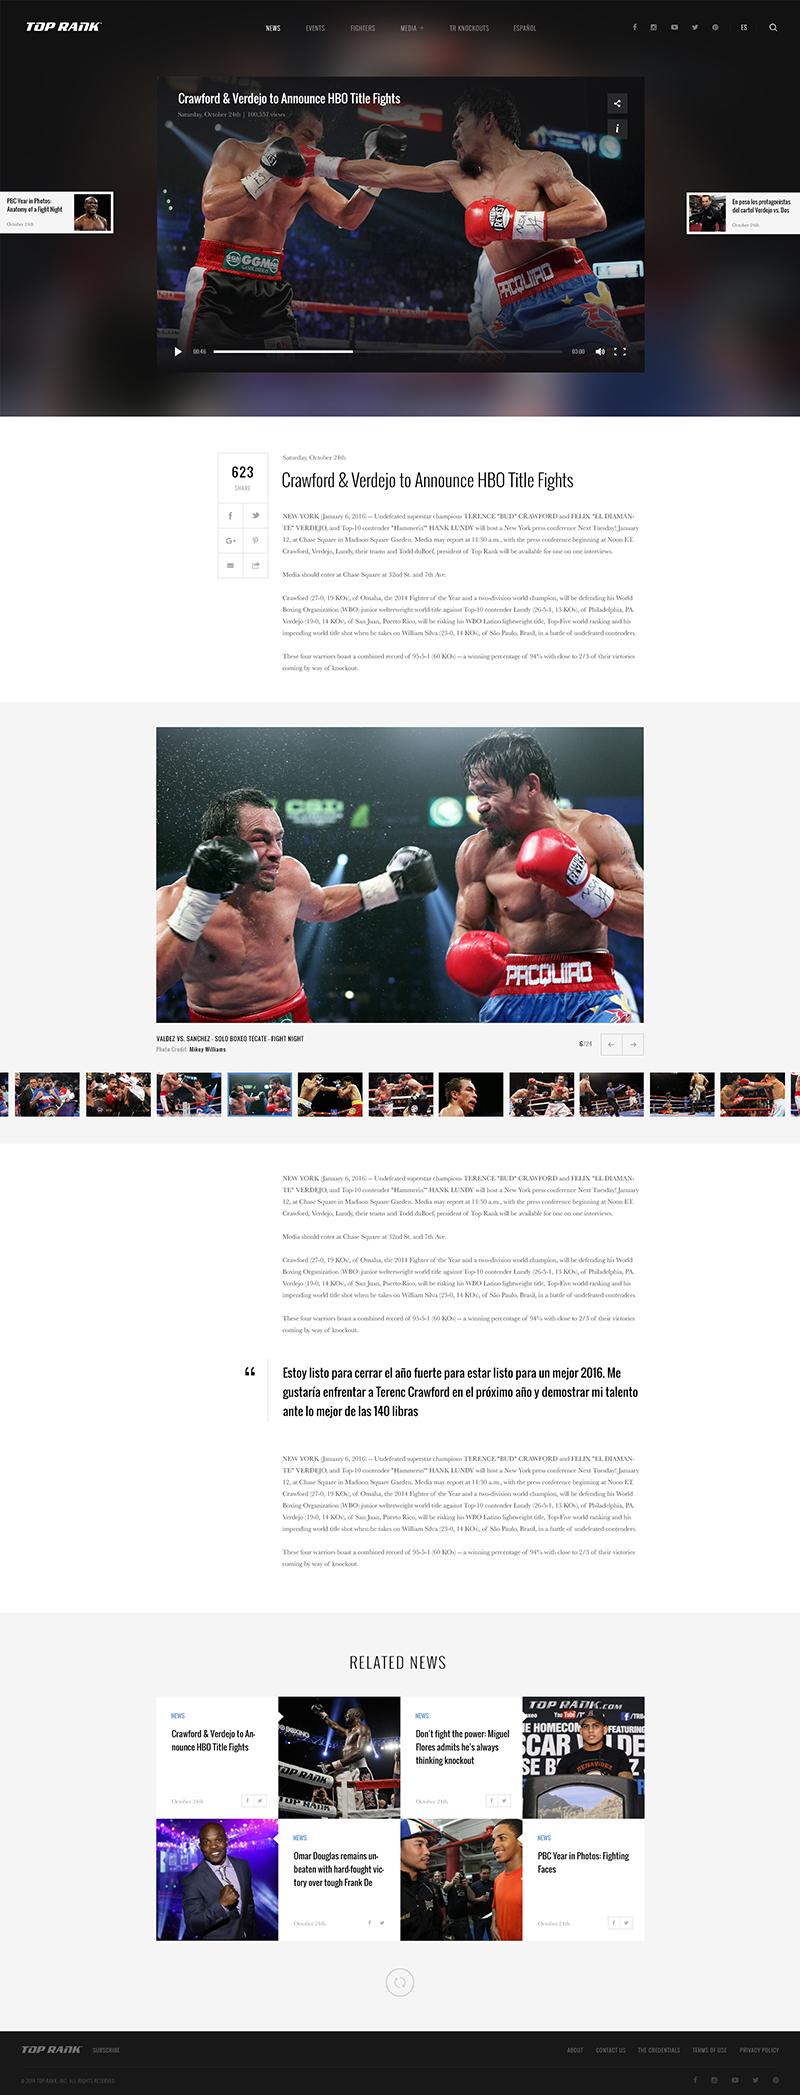 TopRank Page Screenshot